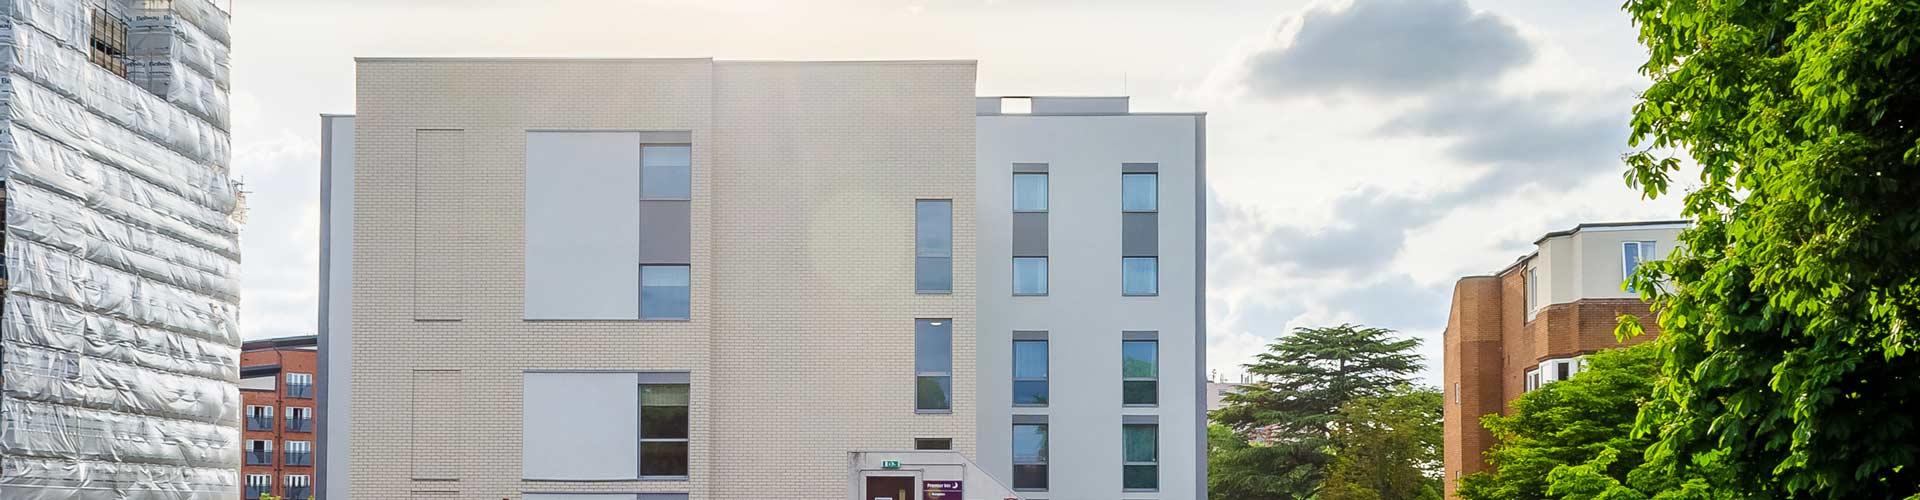 Insulated Render T&T Facades Premier Inn Slough 2